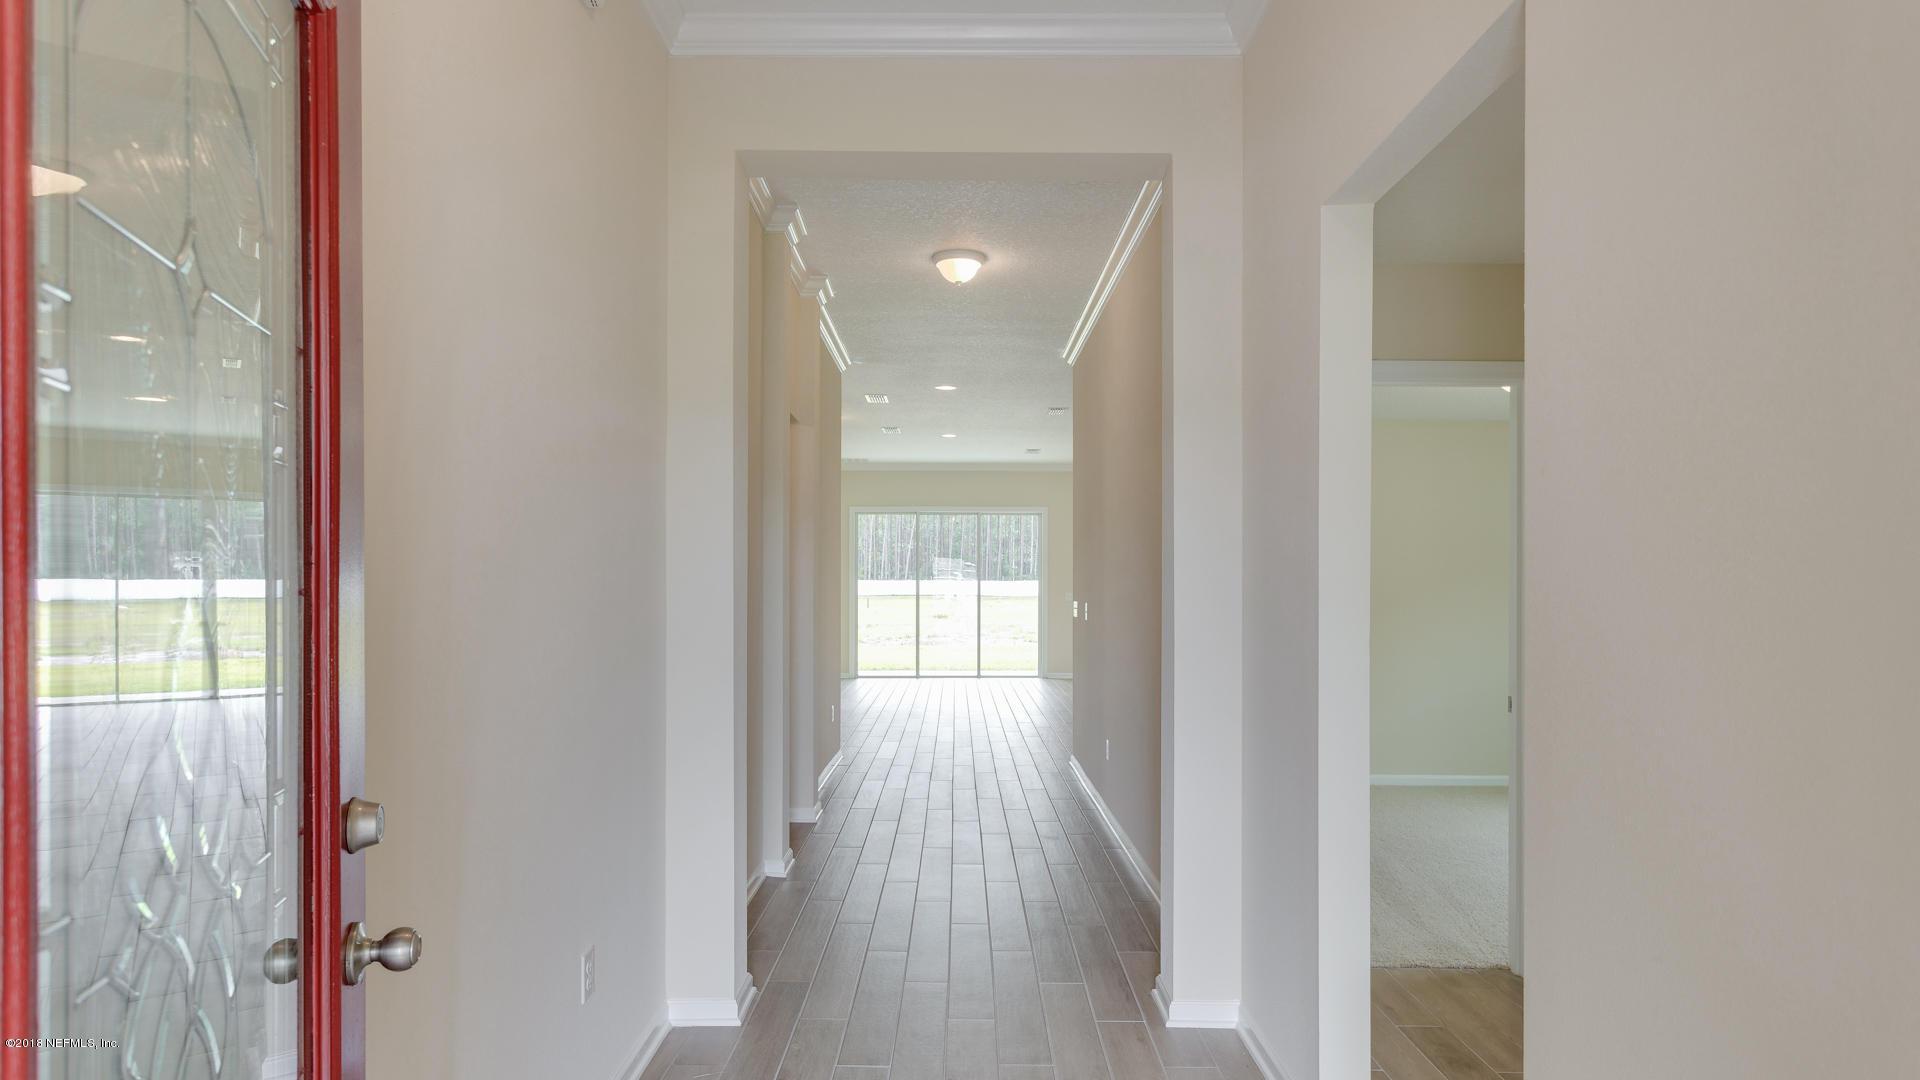 10072 ANDEAN FOX, JACKSONVILLE, FLORIDA 32222, 4 Bedrooms Bedrooms, ,2 BathroomsBathrooms,Residential - single family,For sale,ANDEAN FOX,923004